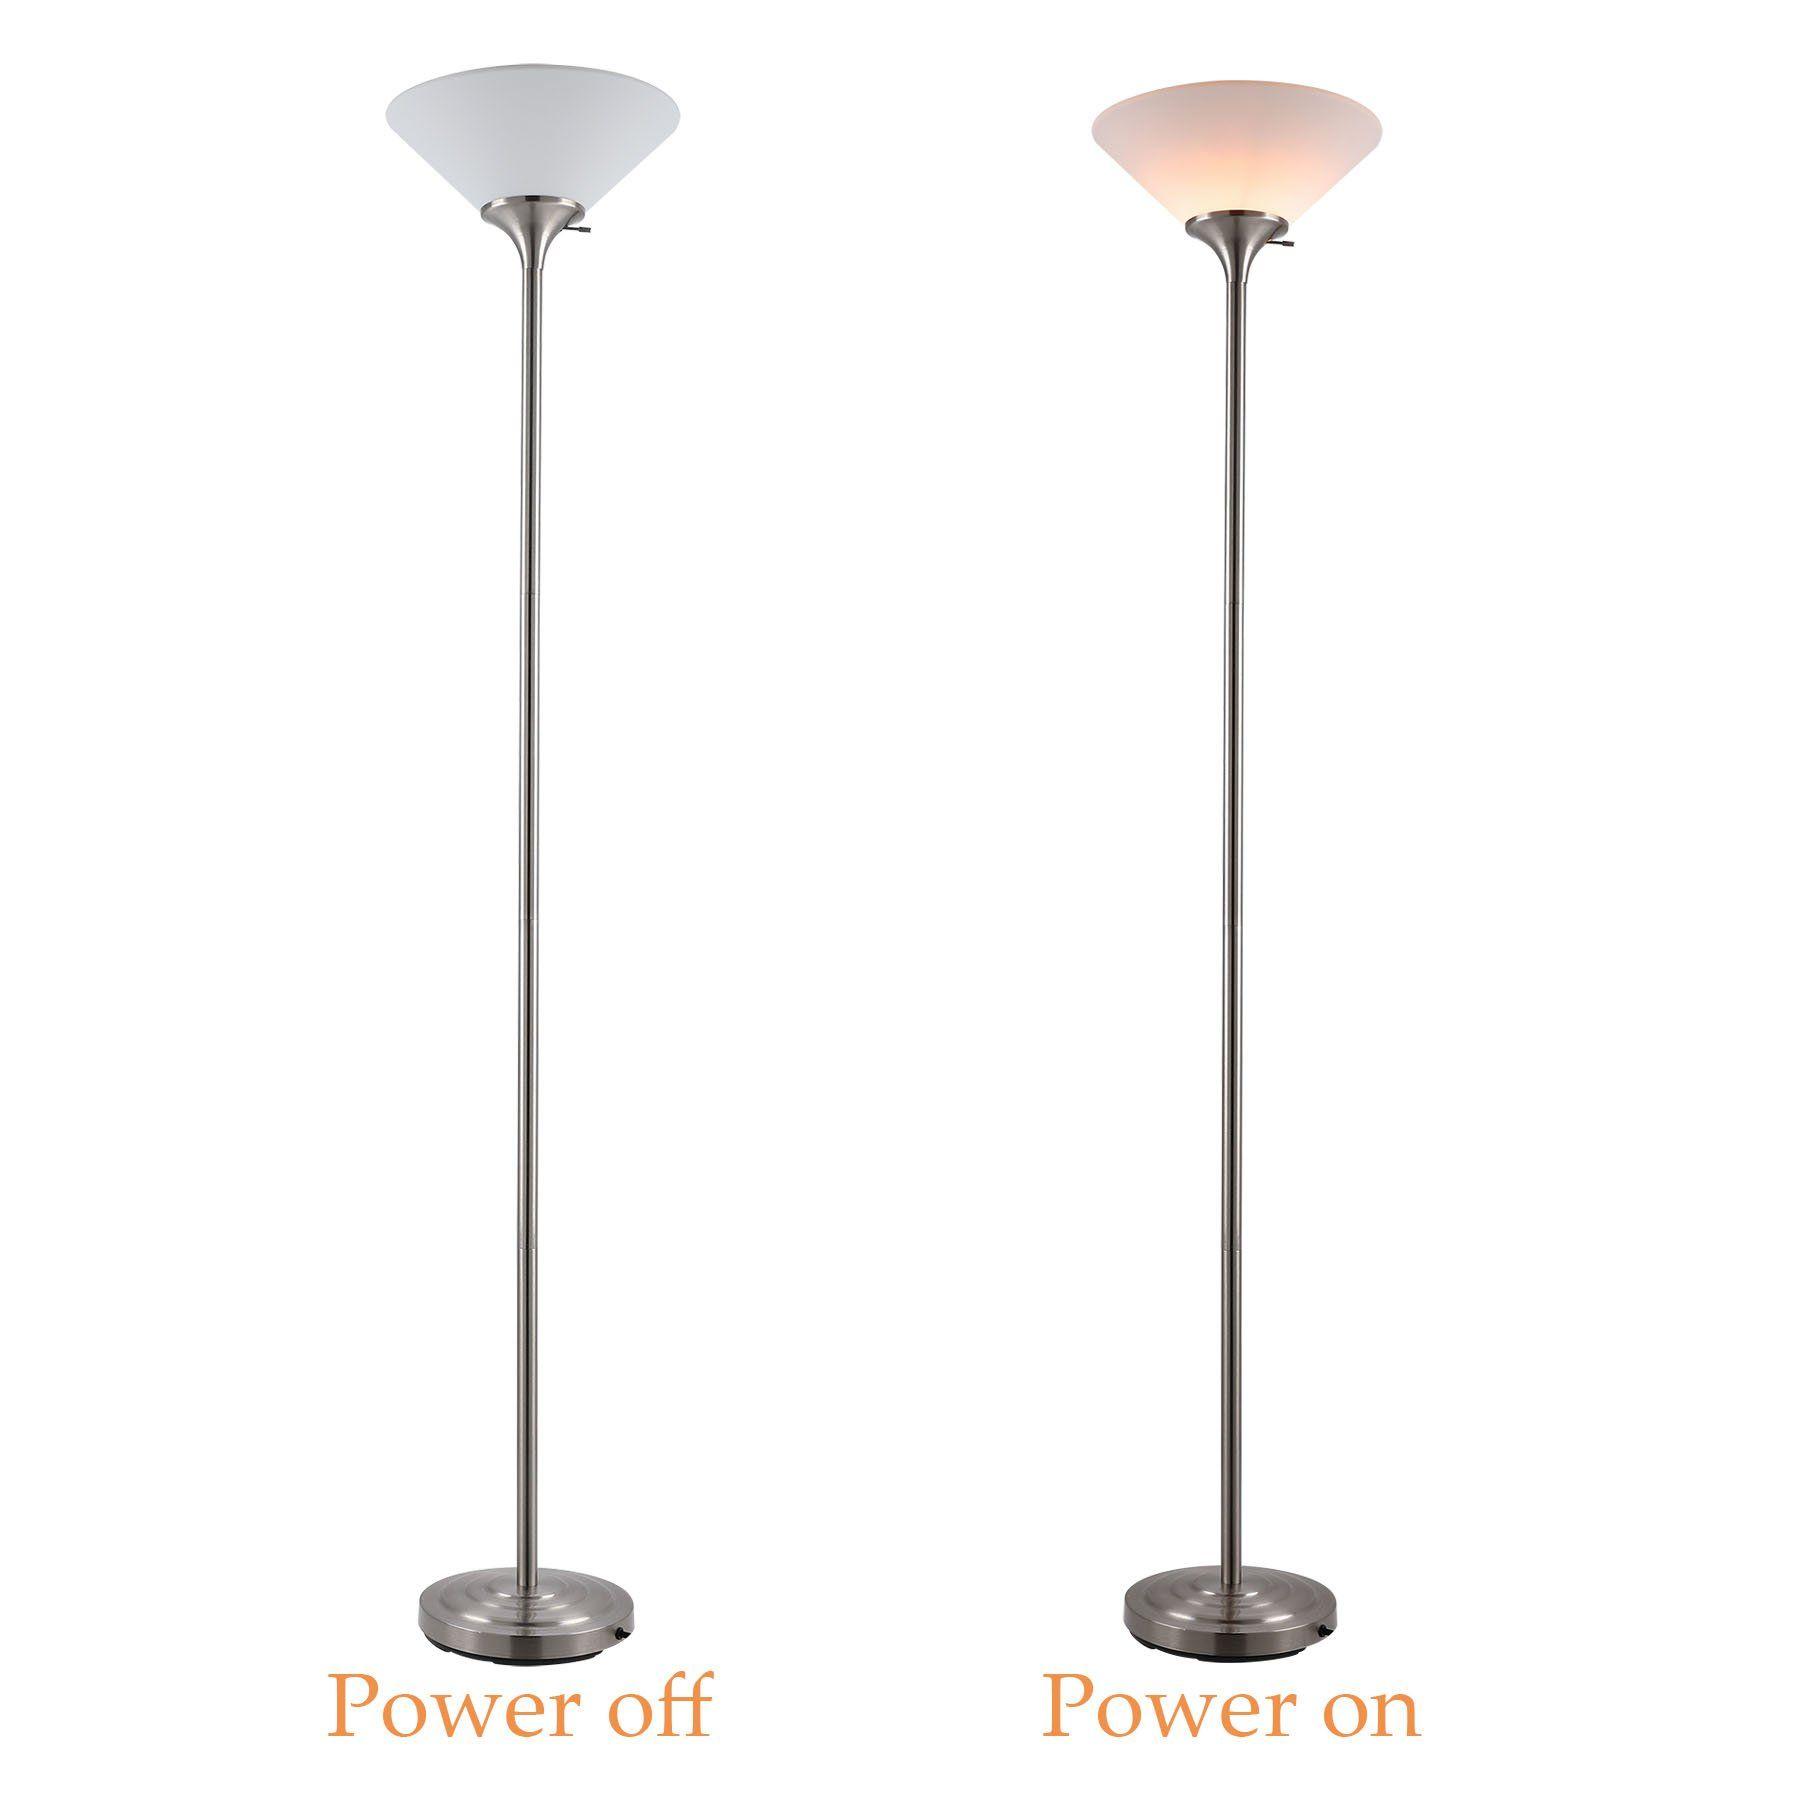 Coz Brushed Steel Tall Floor Lamp For Living Room Bedroom Home Office 71 Standing Uplight Floor Lamp With 14 Shade 150w Torchiere Floor Lamp Lamp Standing Lamp